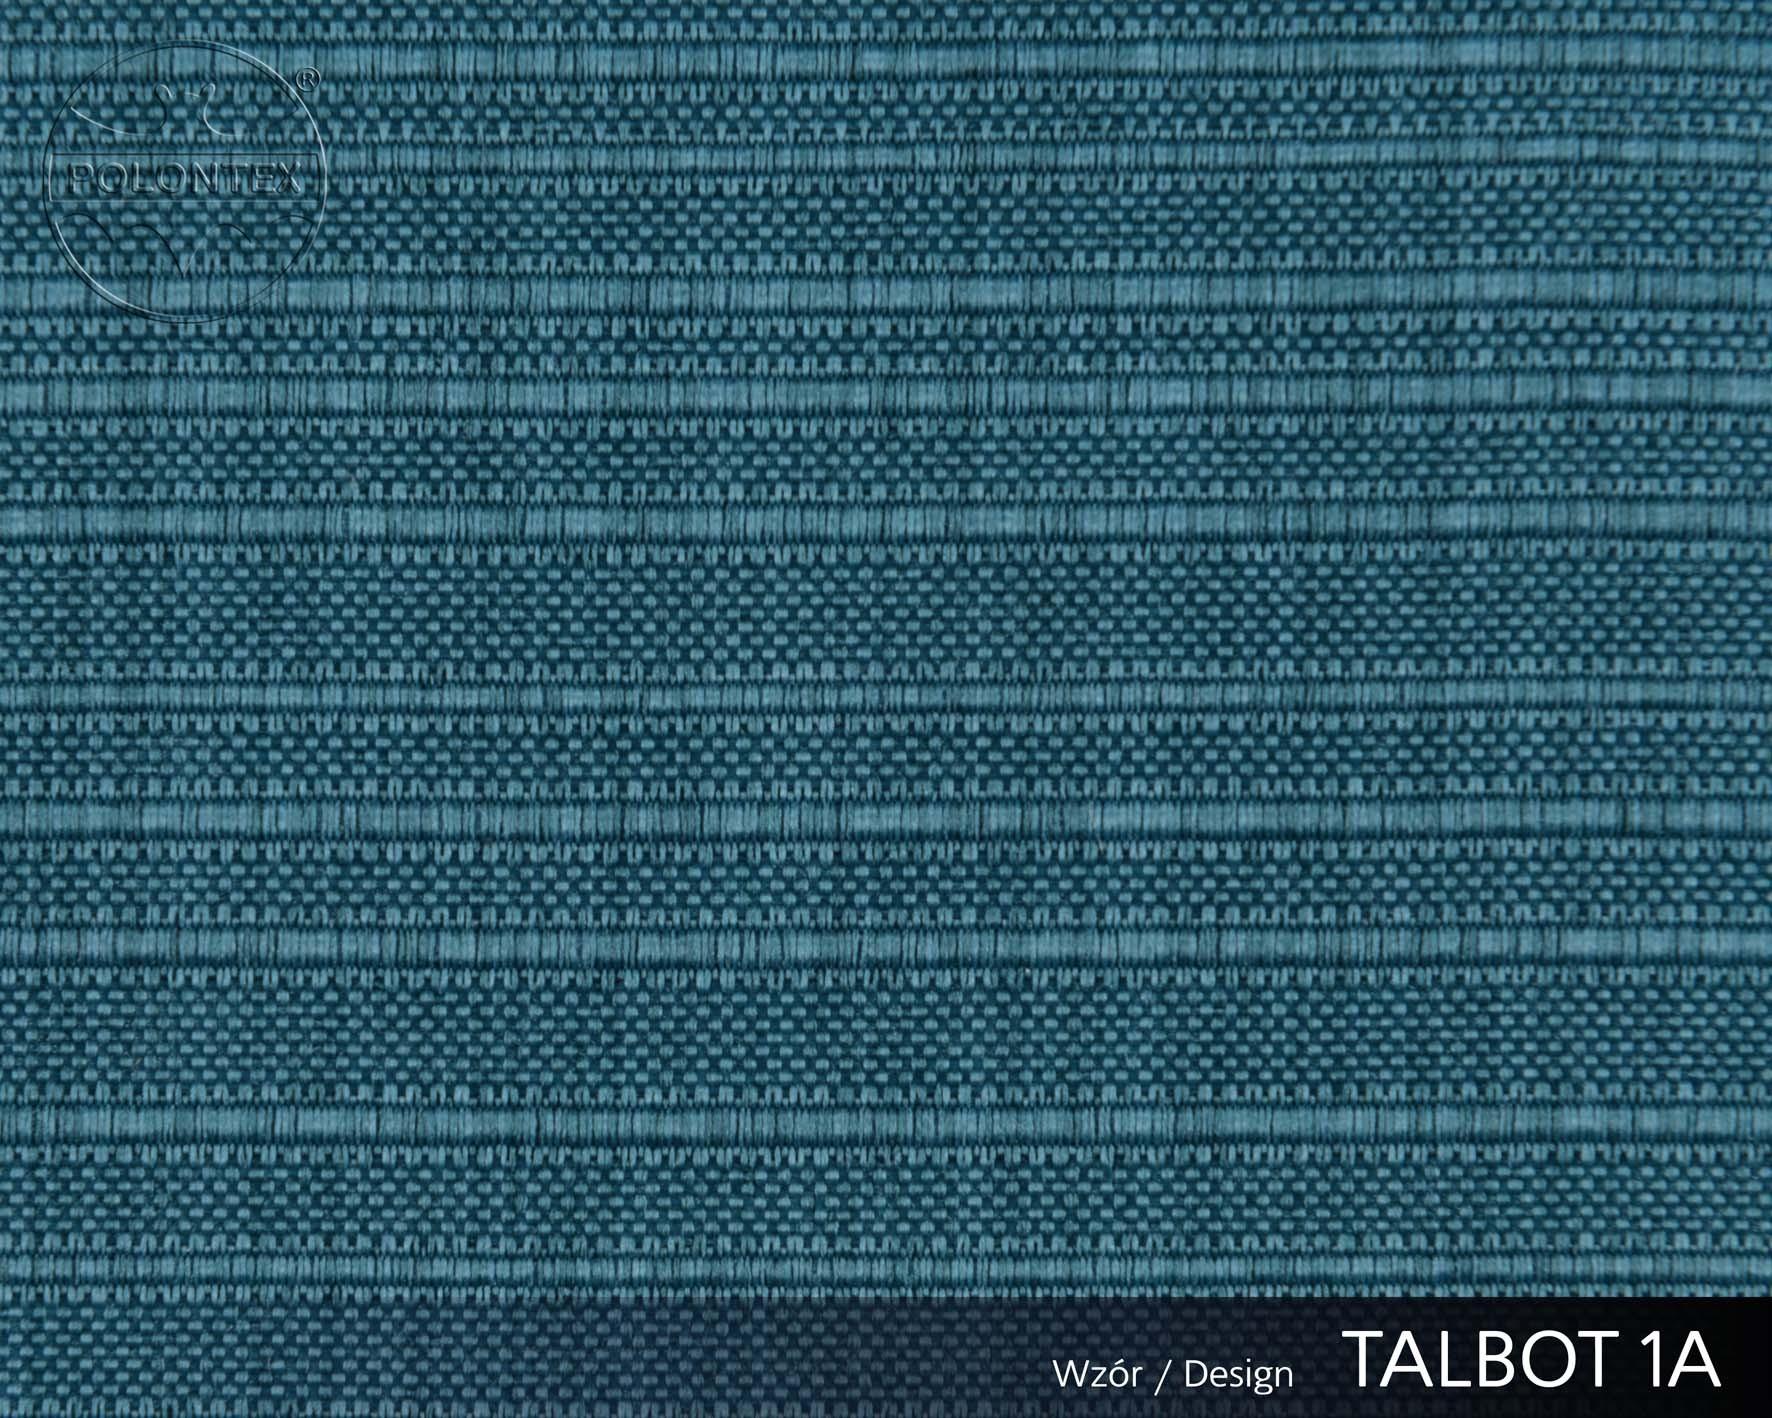 Talbot 1A 5199